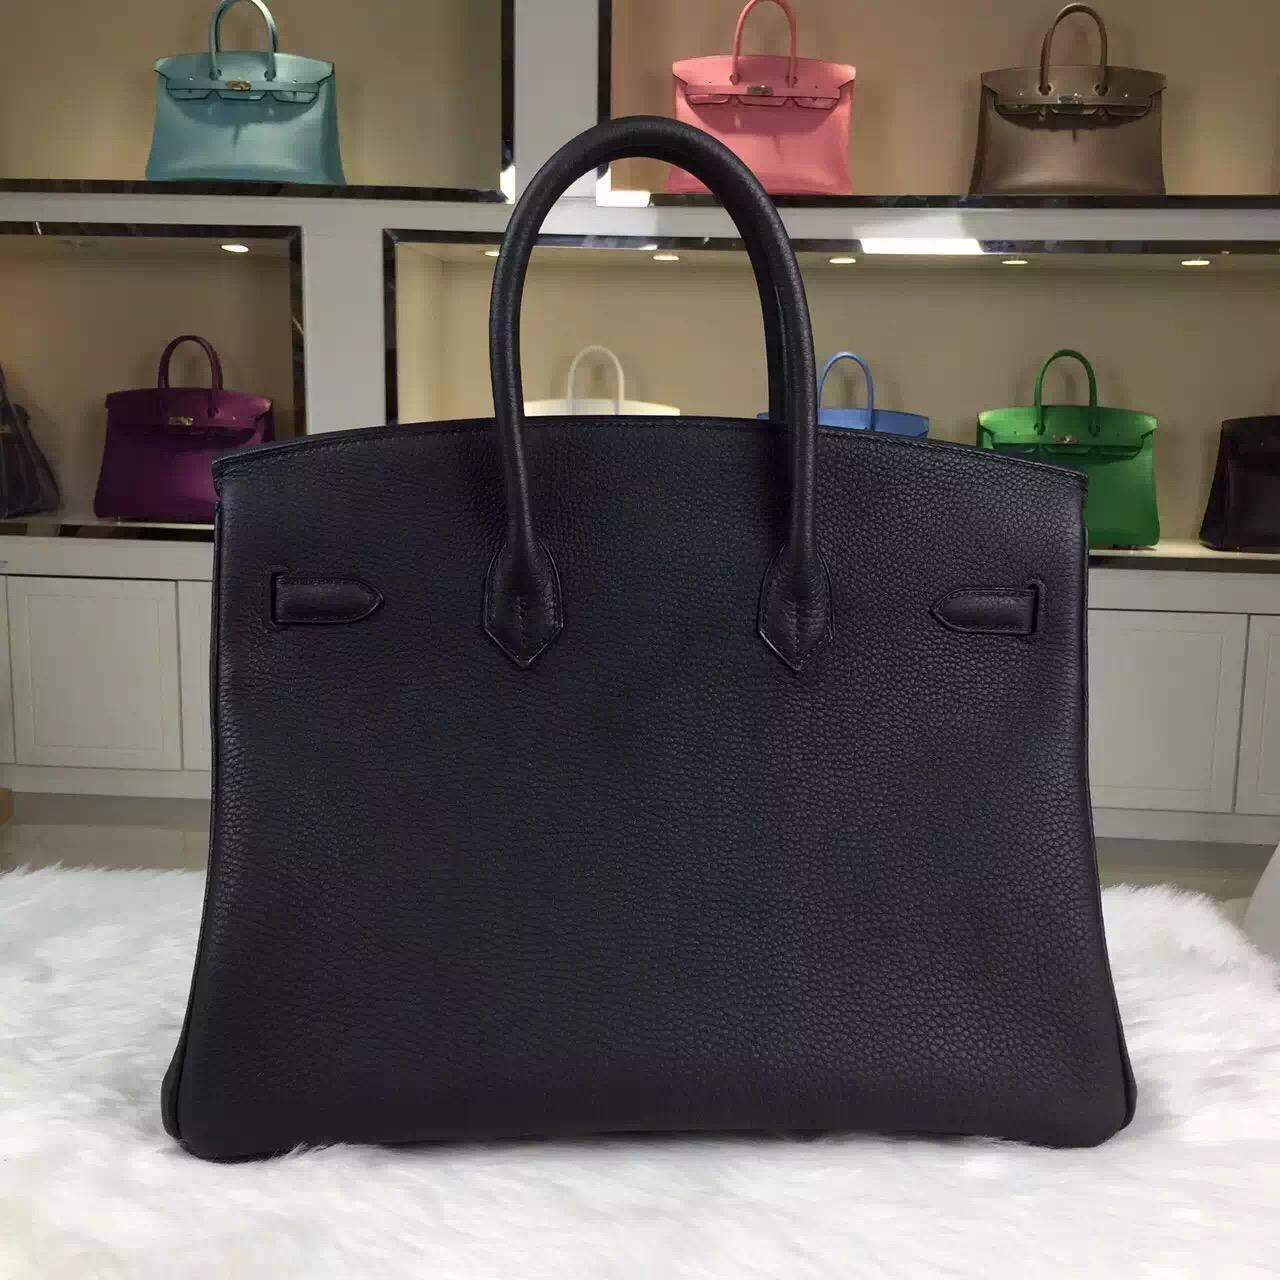 Vip Customized Hermes Birkin Bag 35cm 89 Black Togo Leather Silver Hardware